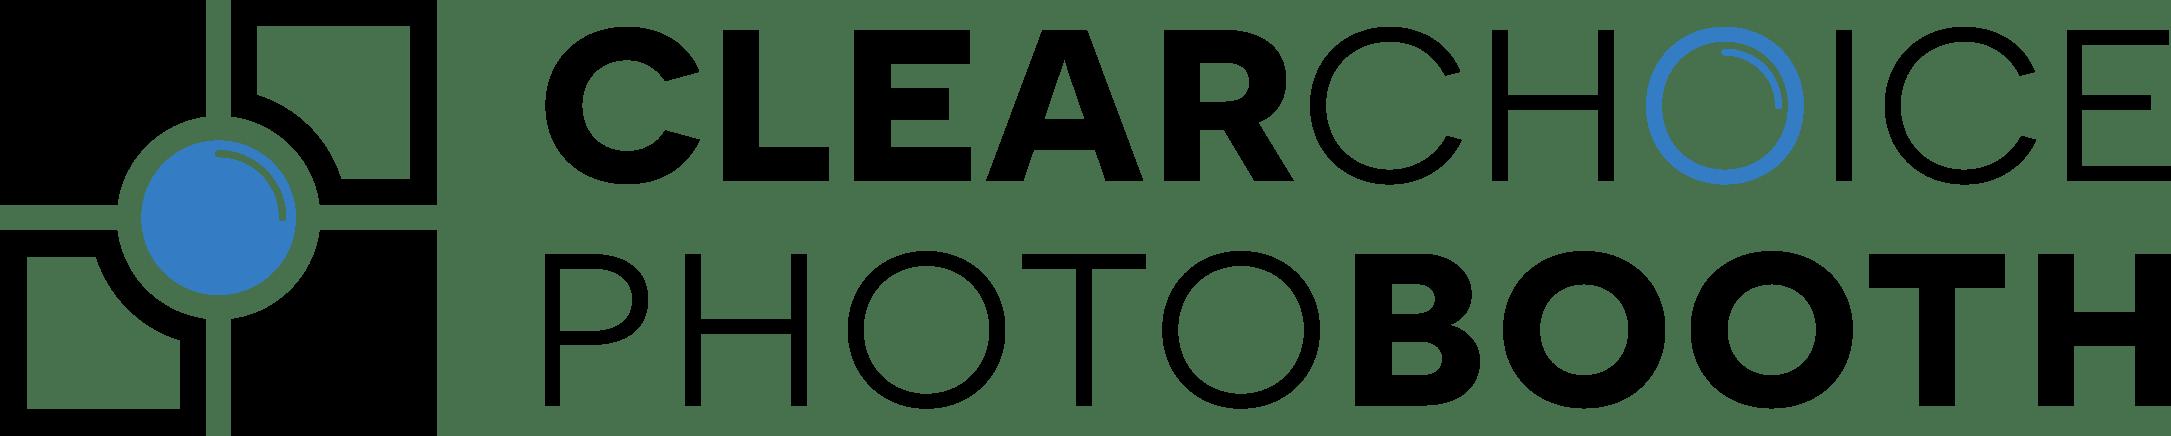 Clear Choice Photo Booth